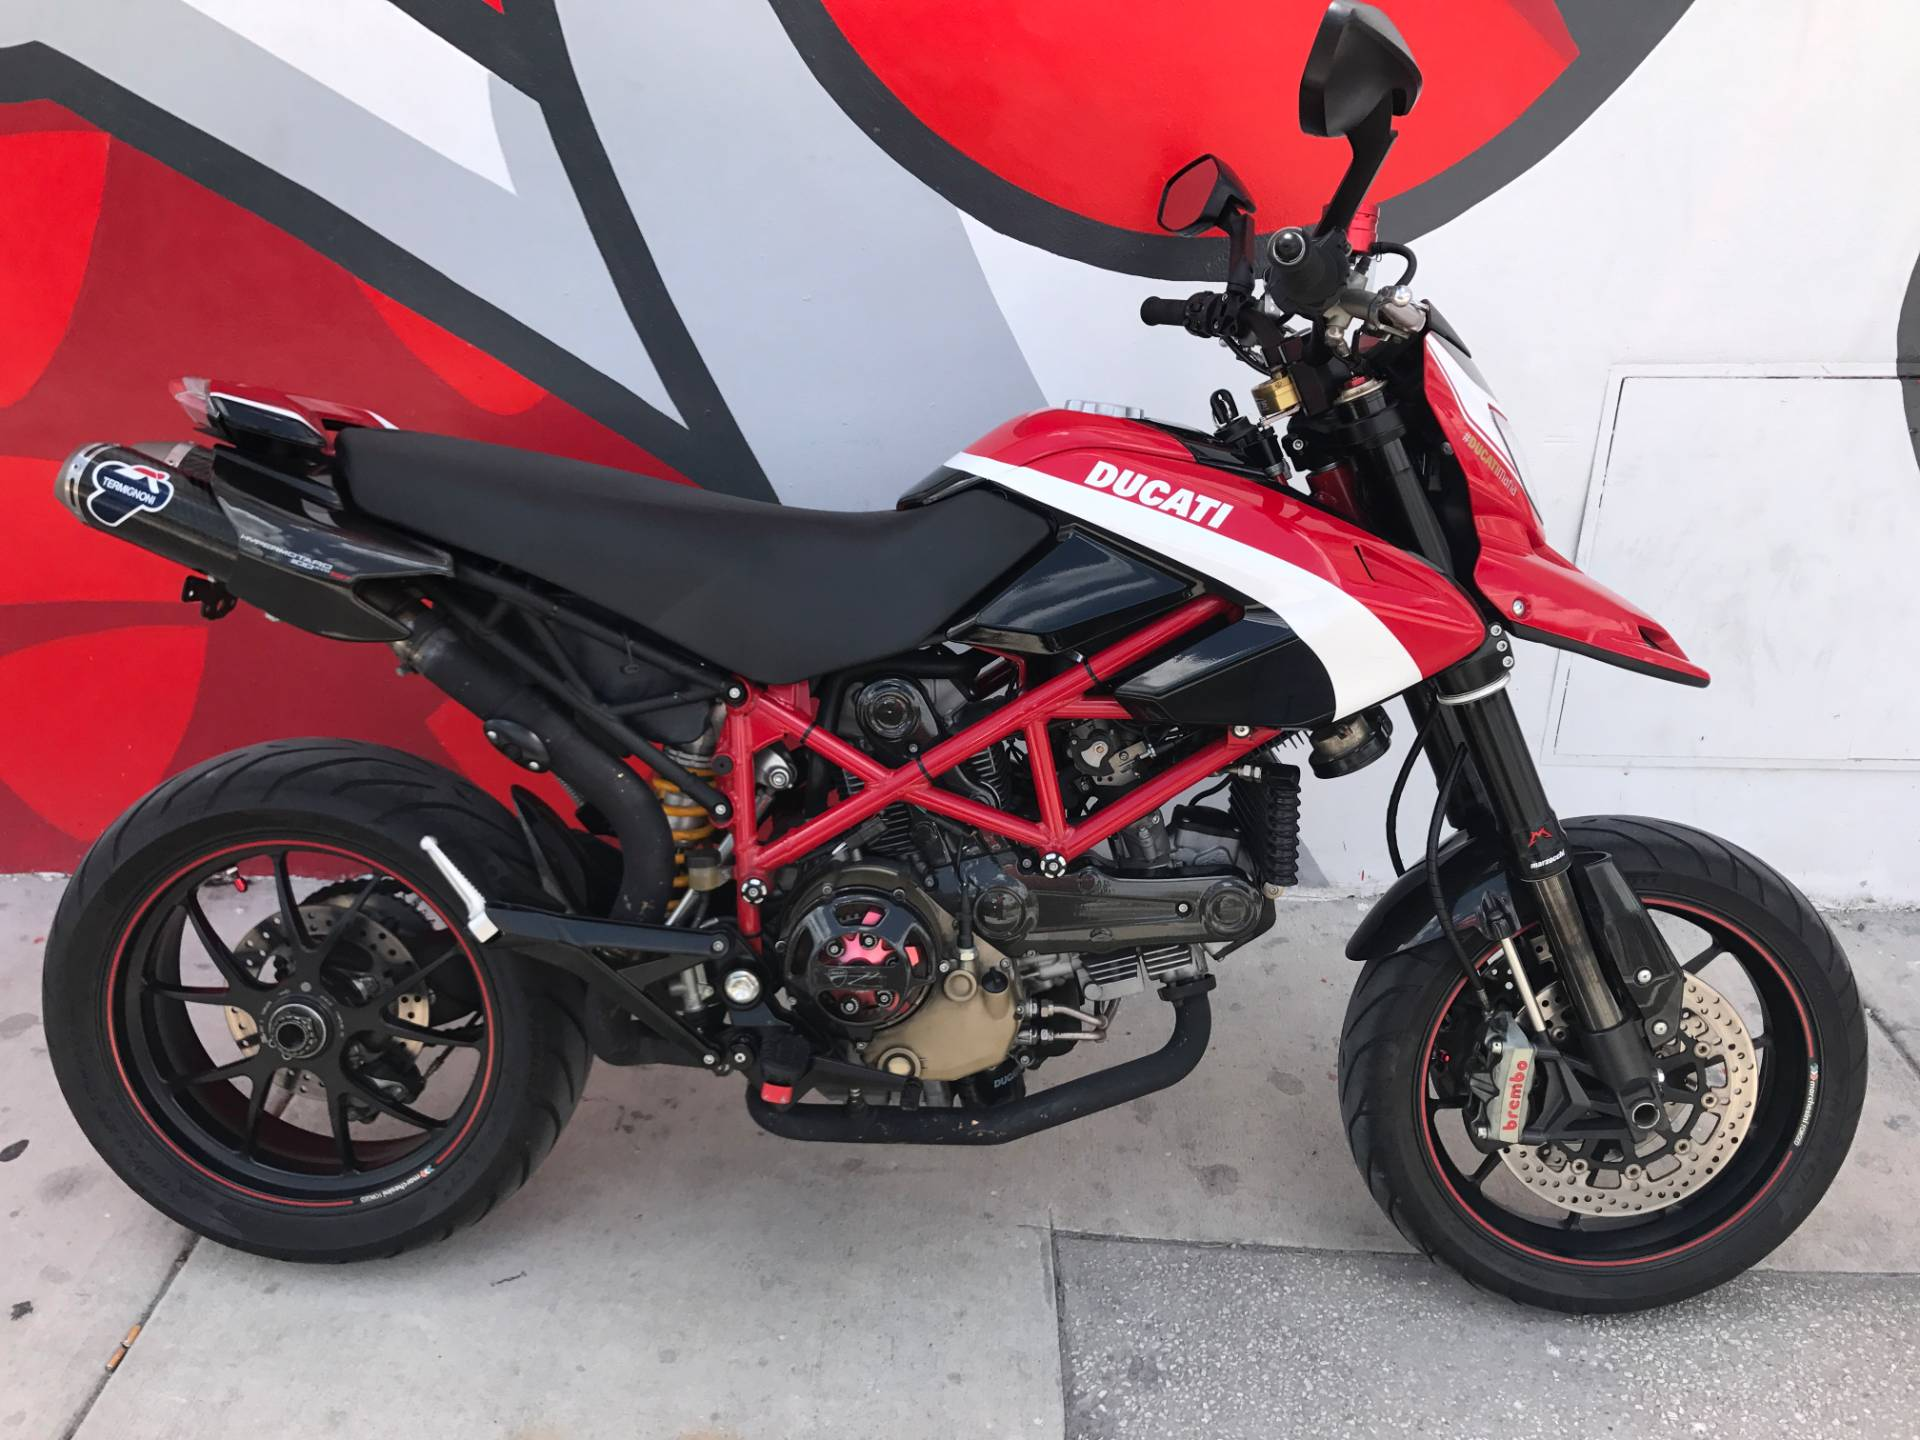 2012 Hypermotard 1100 EVO SP